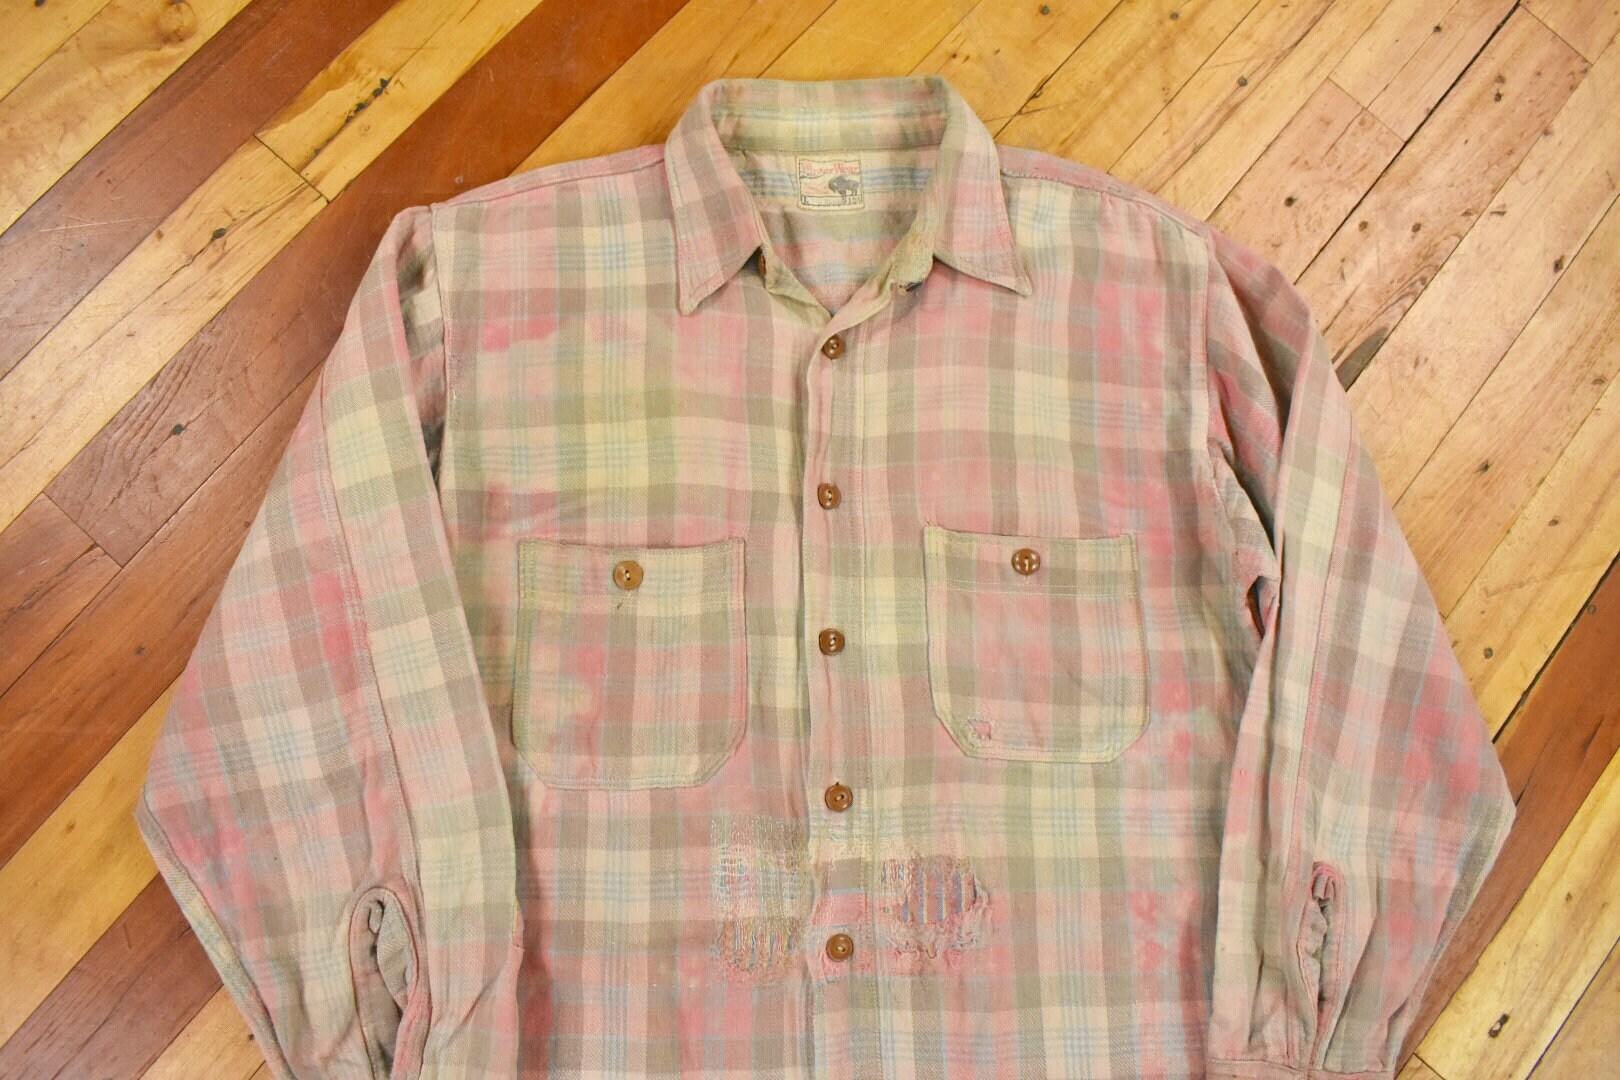 New 1930s Mens Fashion Ties 1930S Faded Flannel SM Plaid Cotton Work Shirt Vintage $20.00 AT vintagedancer.com